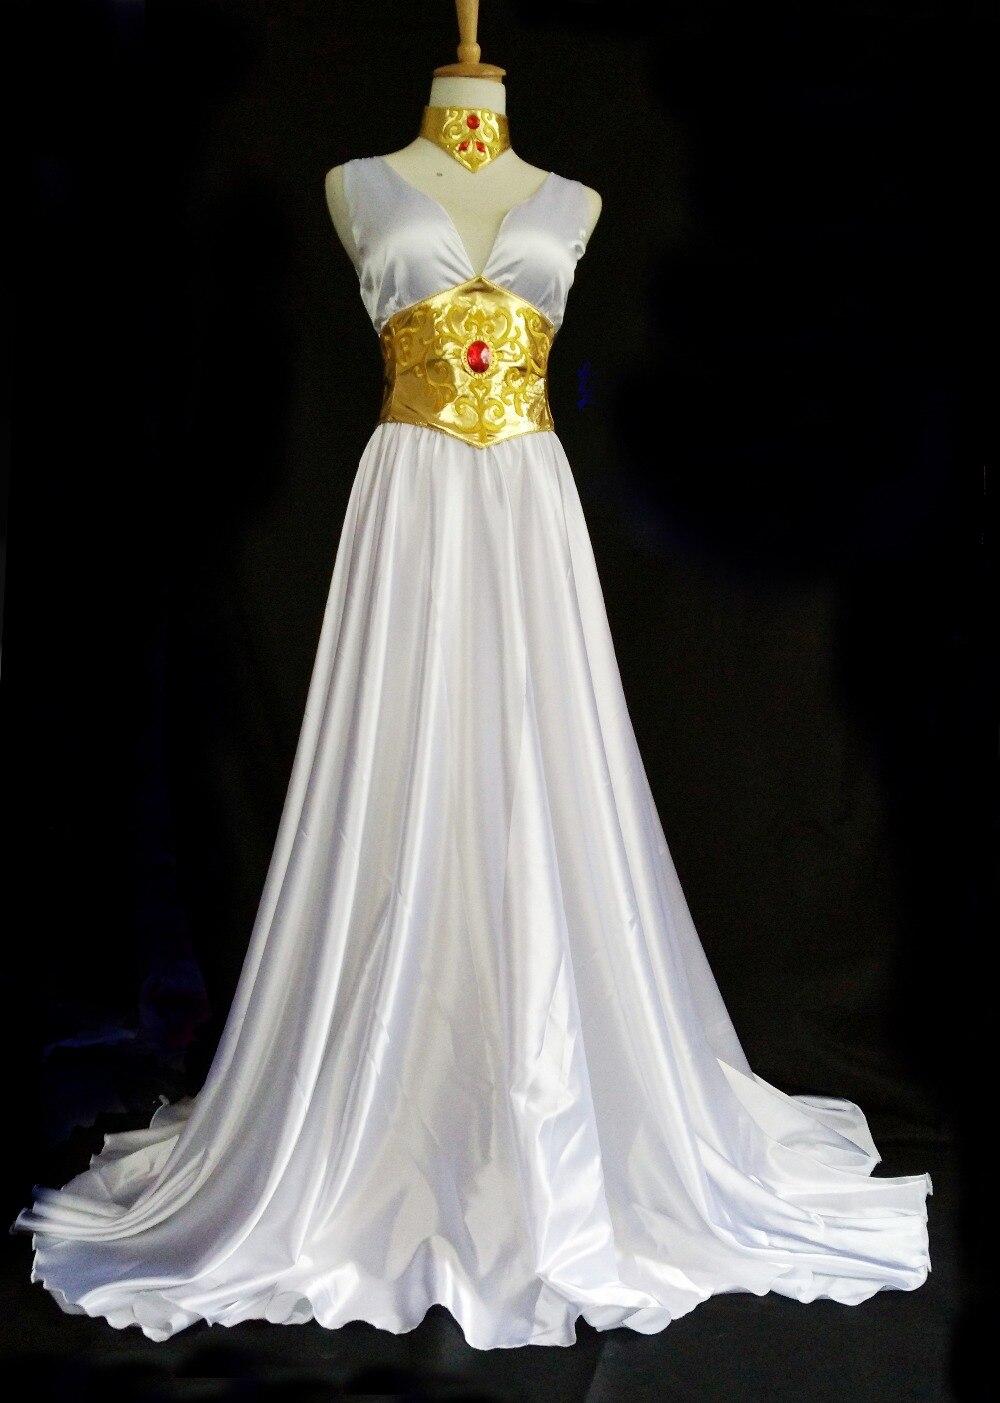 Anime Saint Seiya Athena White Mullet Lolita dress Cosplay Costume Gorgeous party Dress custom made halloween costume for women